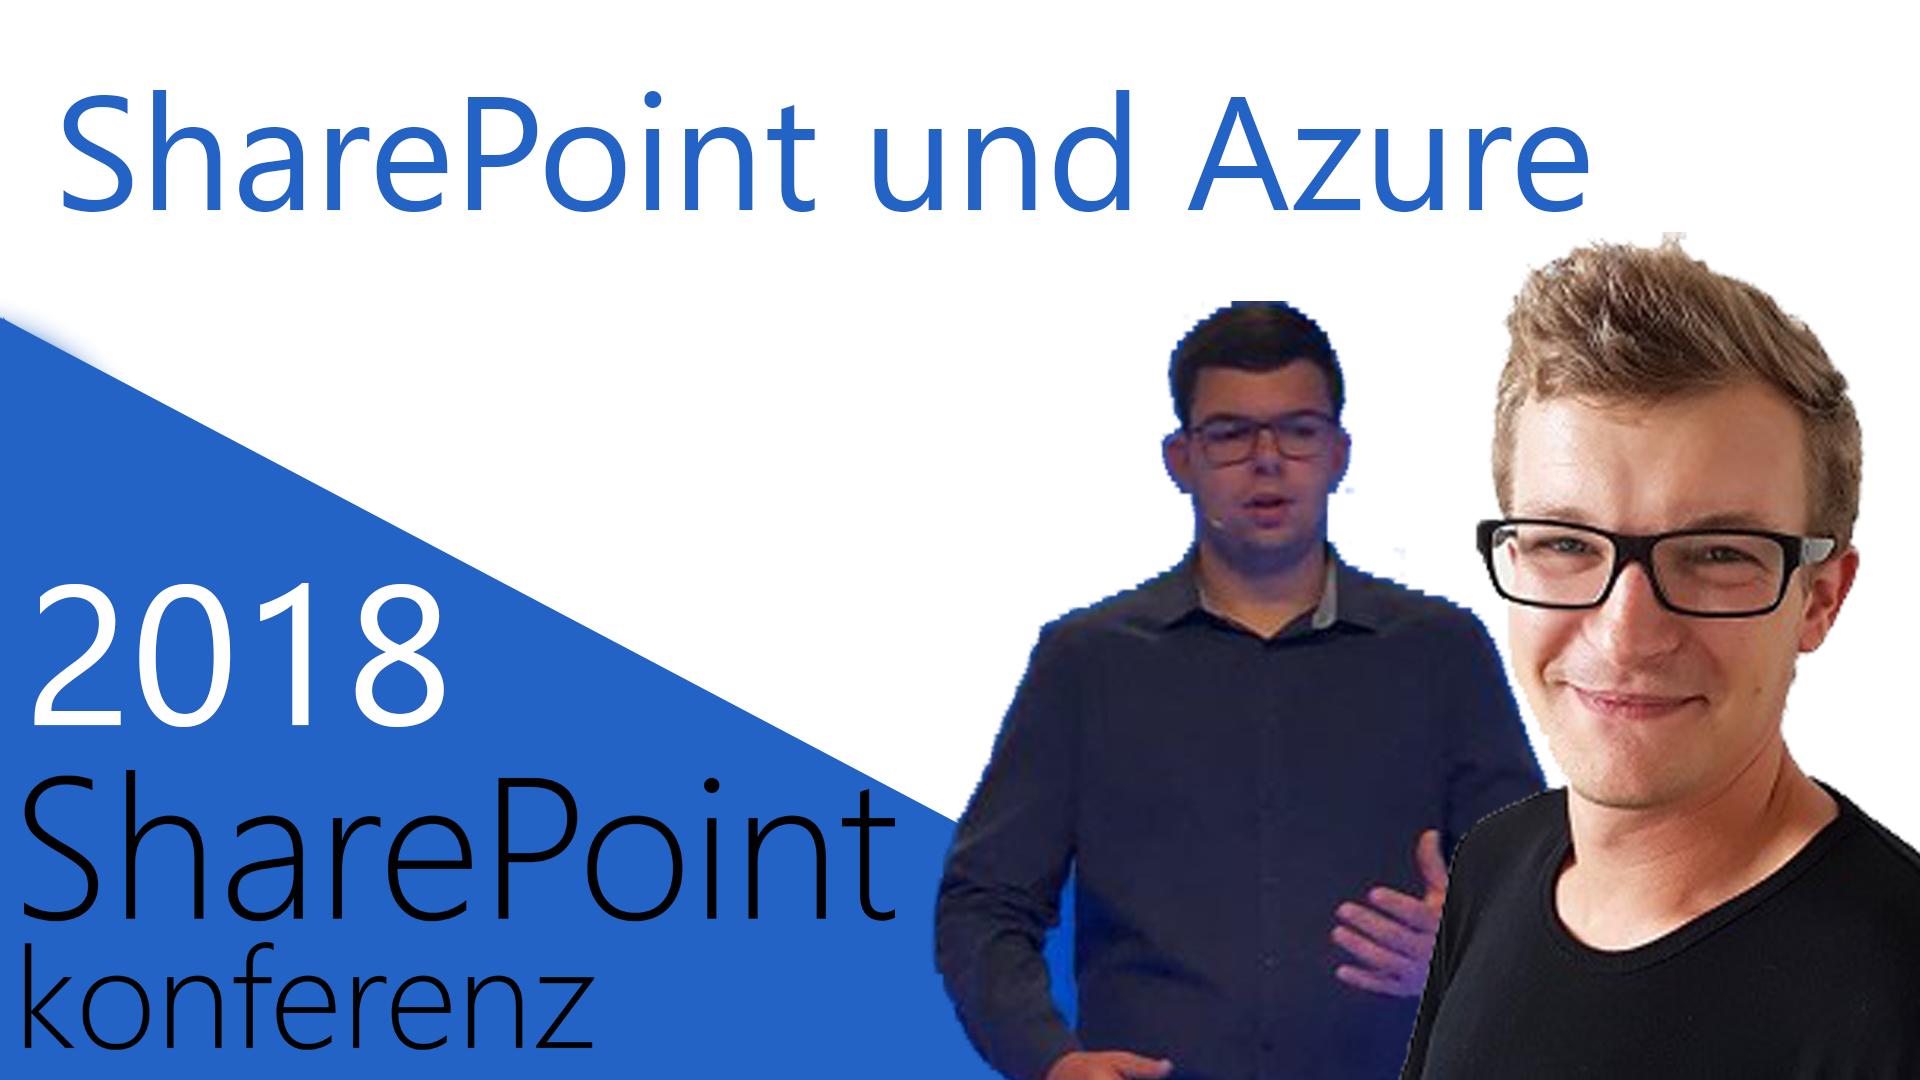 2018/SharePointKonferenz/azure